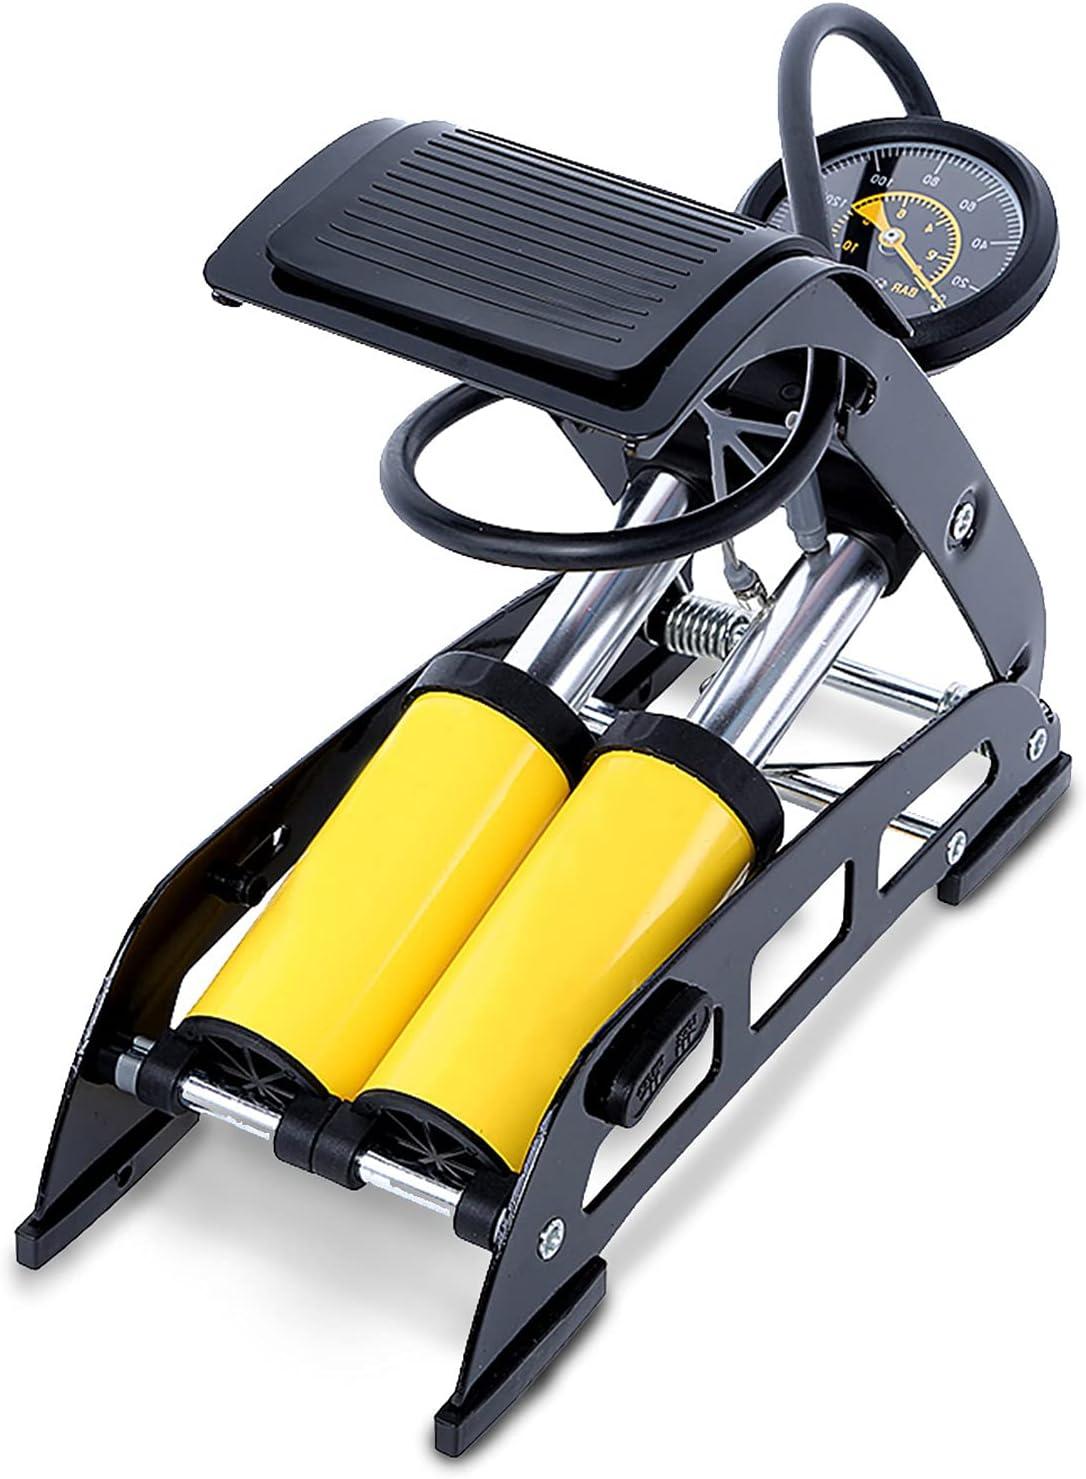 Aiung Special price Boston Mall Bike Foot Pump 160PSI Portable Pu Aluminum Air Floor